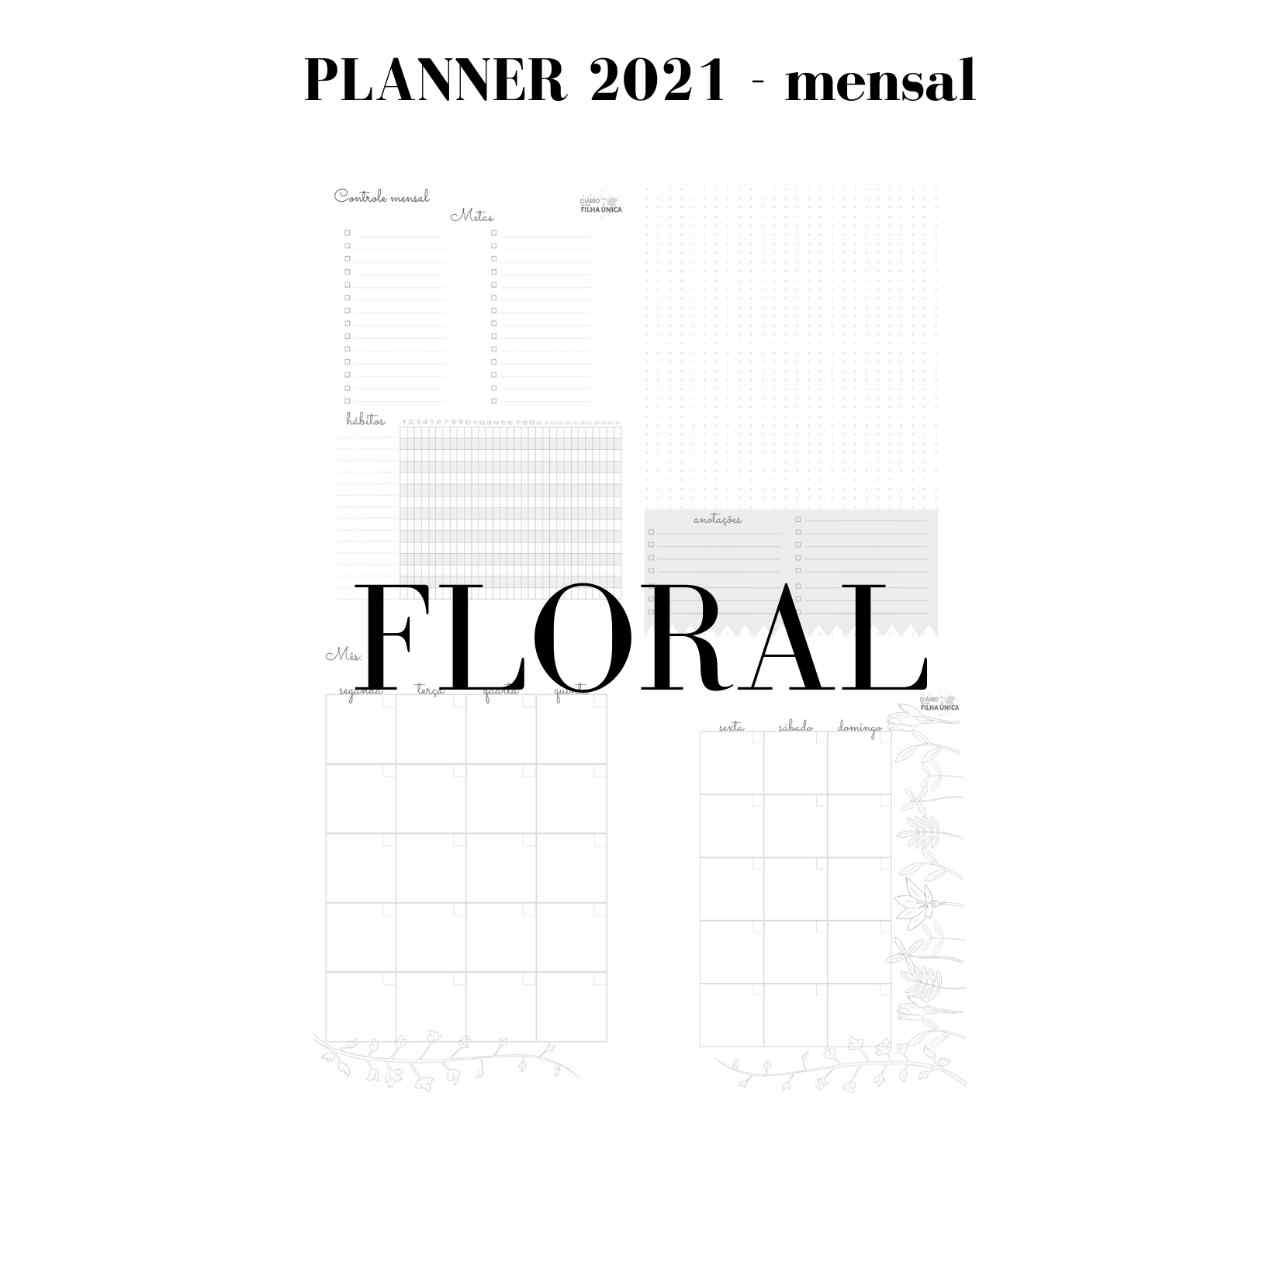 Planner 2021 - Karina Favato